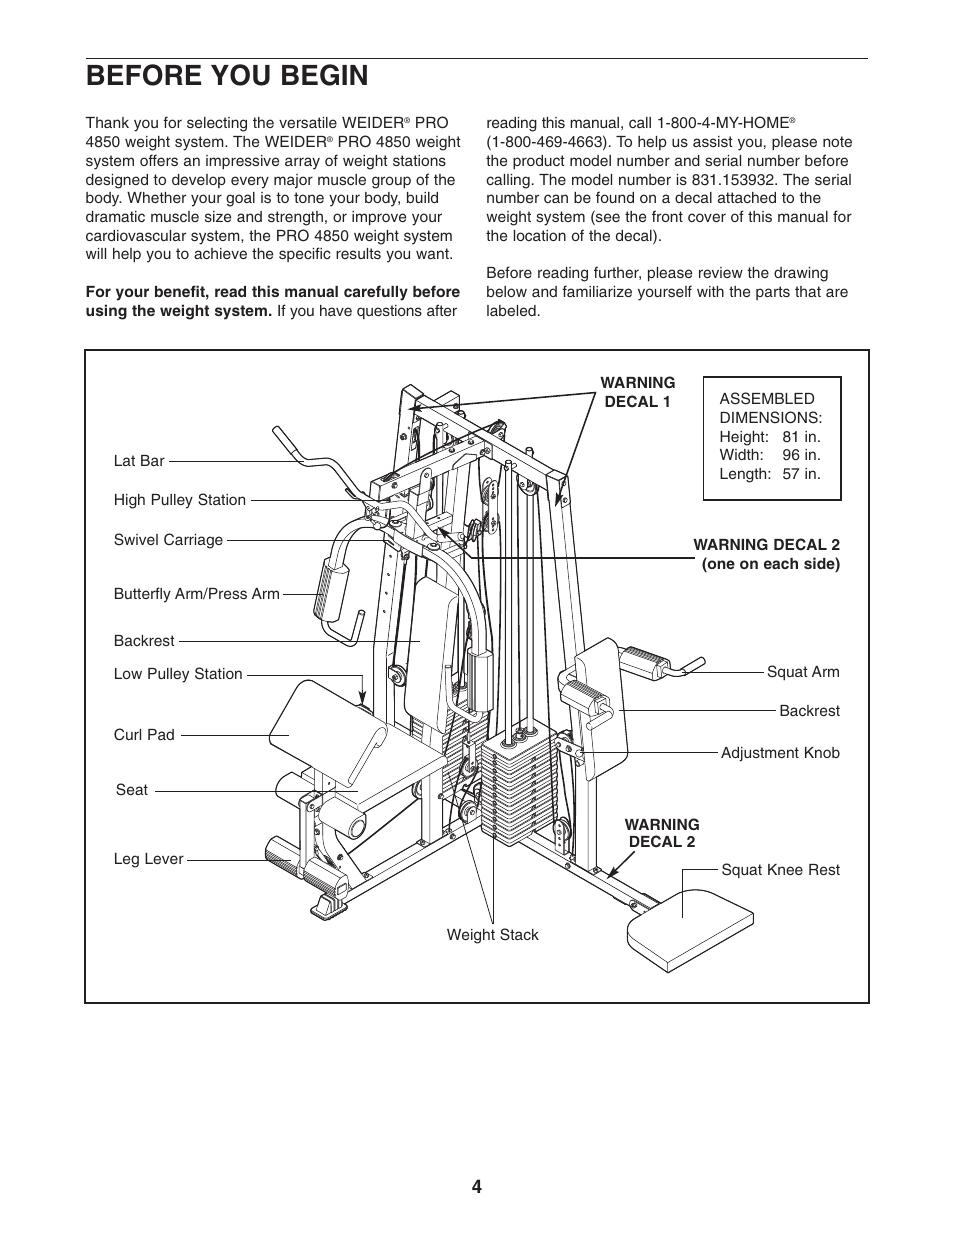 Weider pro 4850 manual pdf.